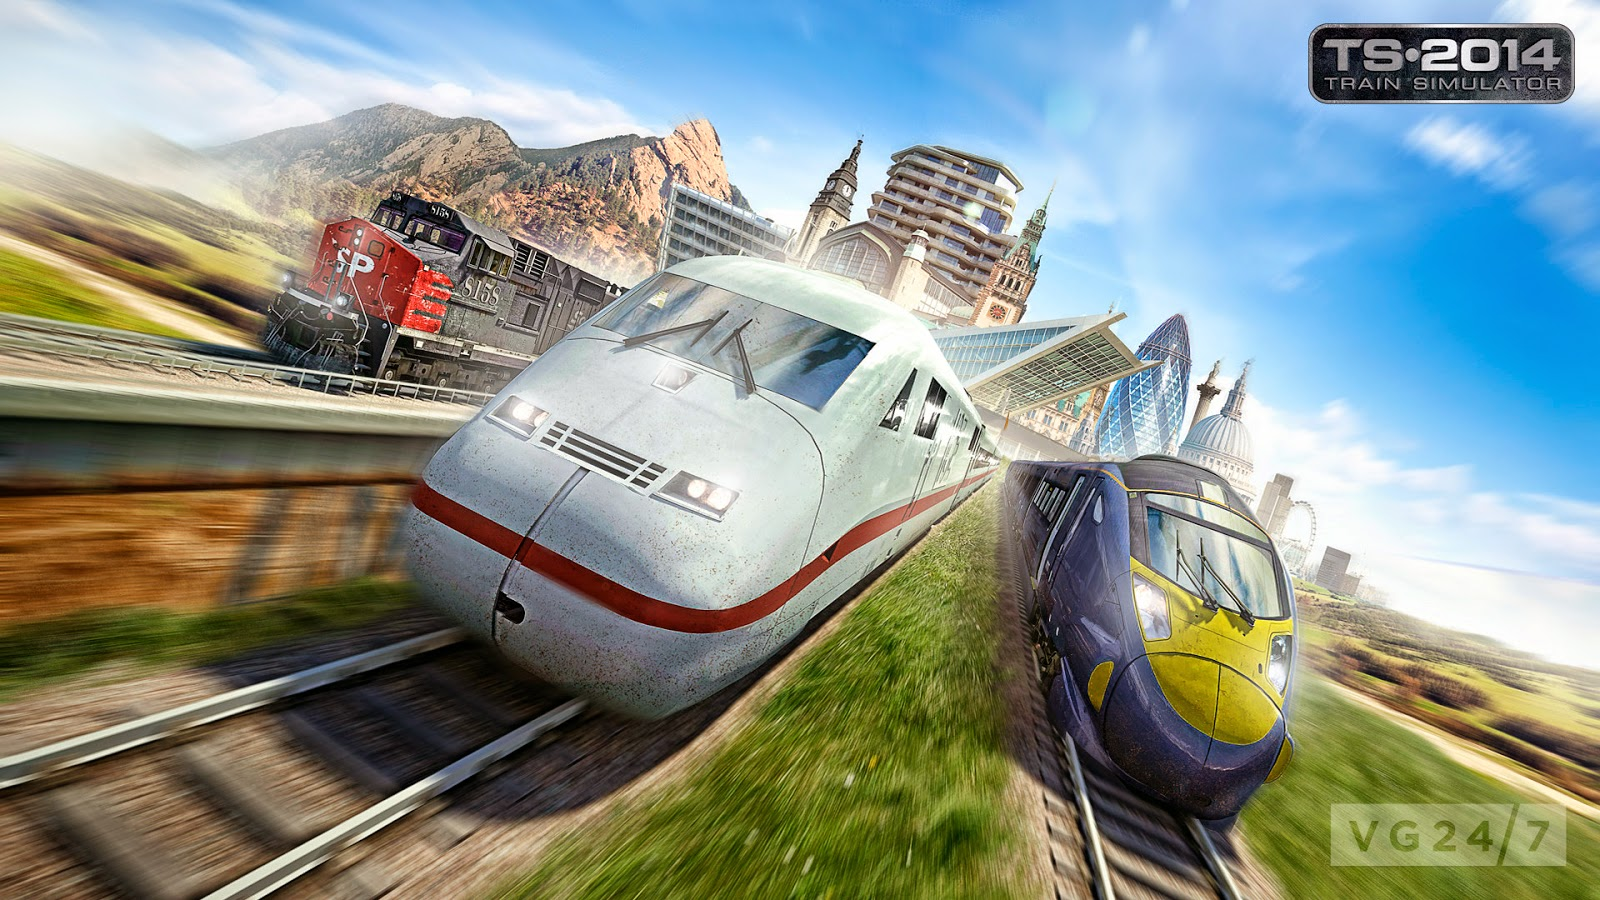 Train simulator 2014 indir